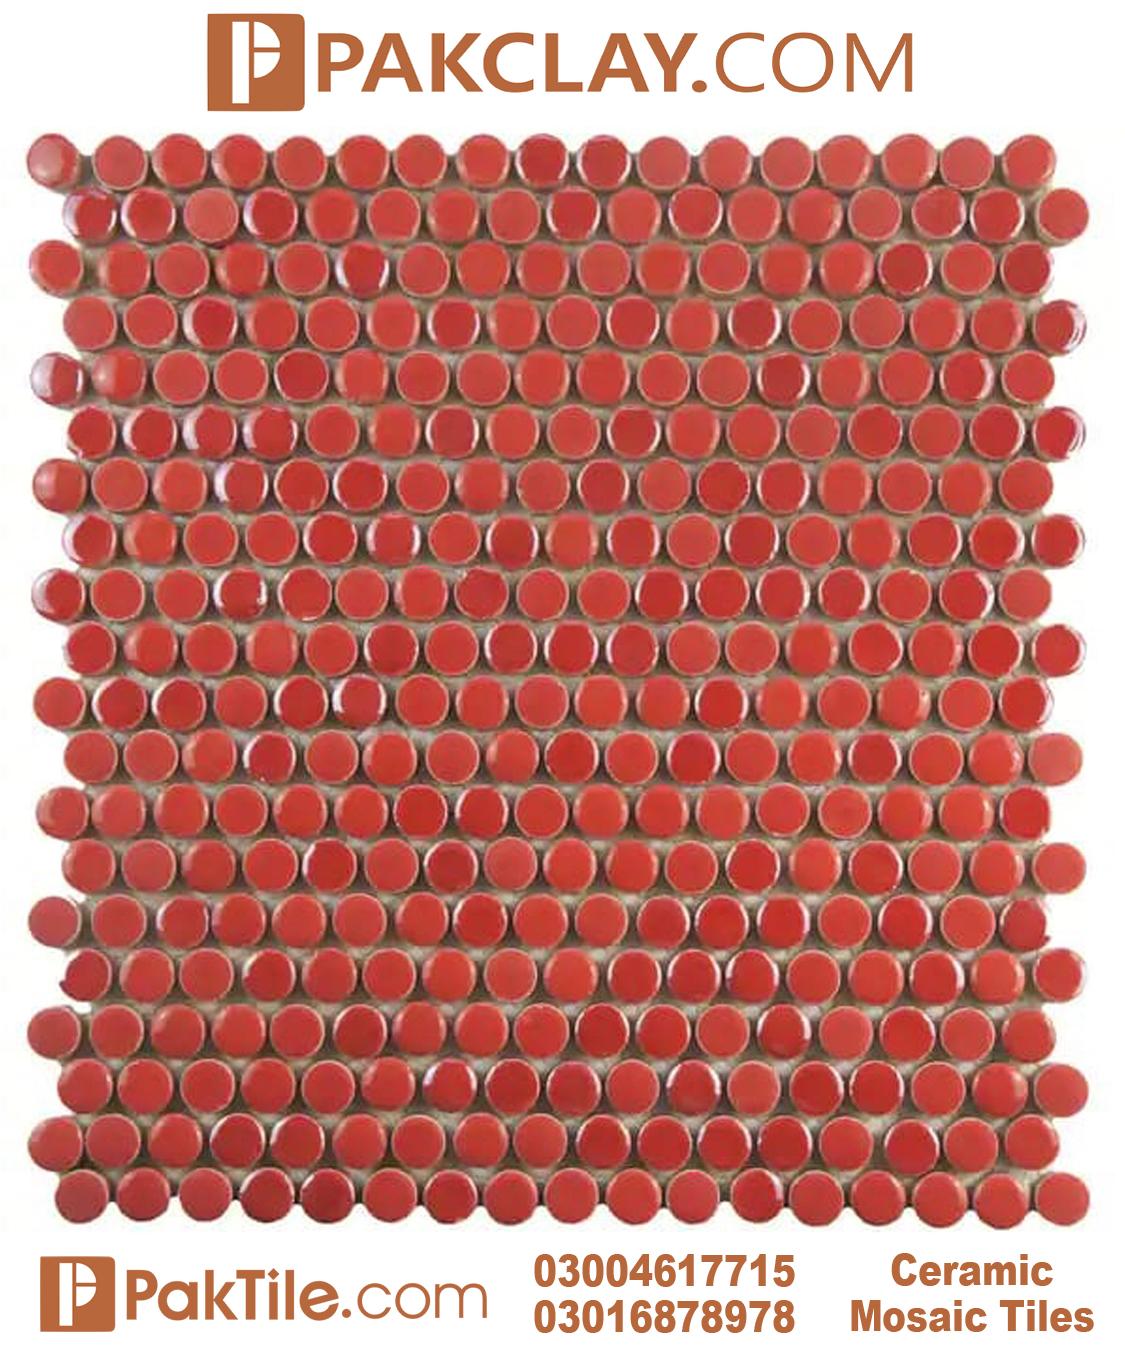 Red Color Ceramic Floor Tiles Design in Pakistan